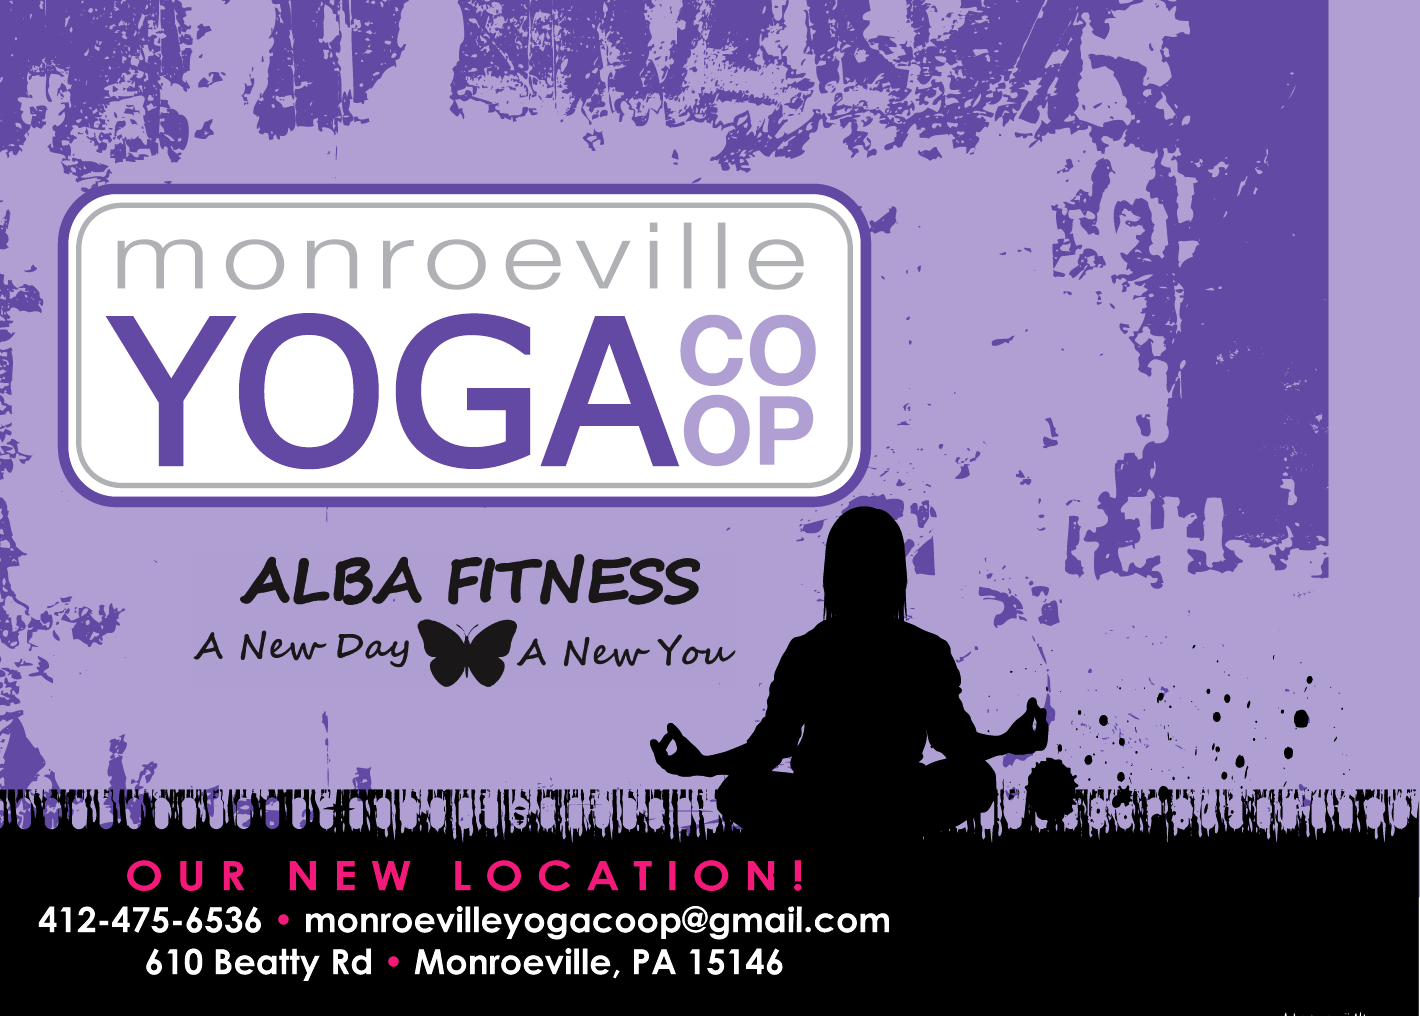 The Monroeville Yoga Co-Op